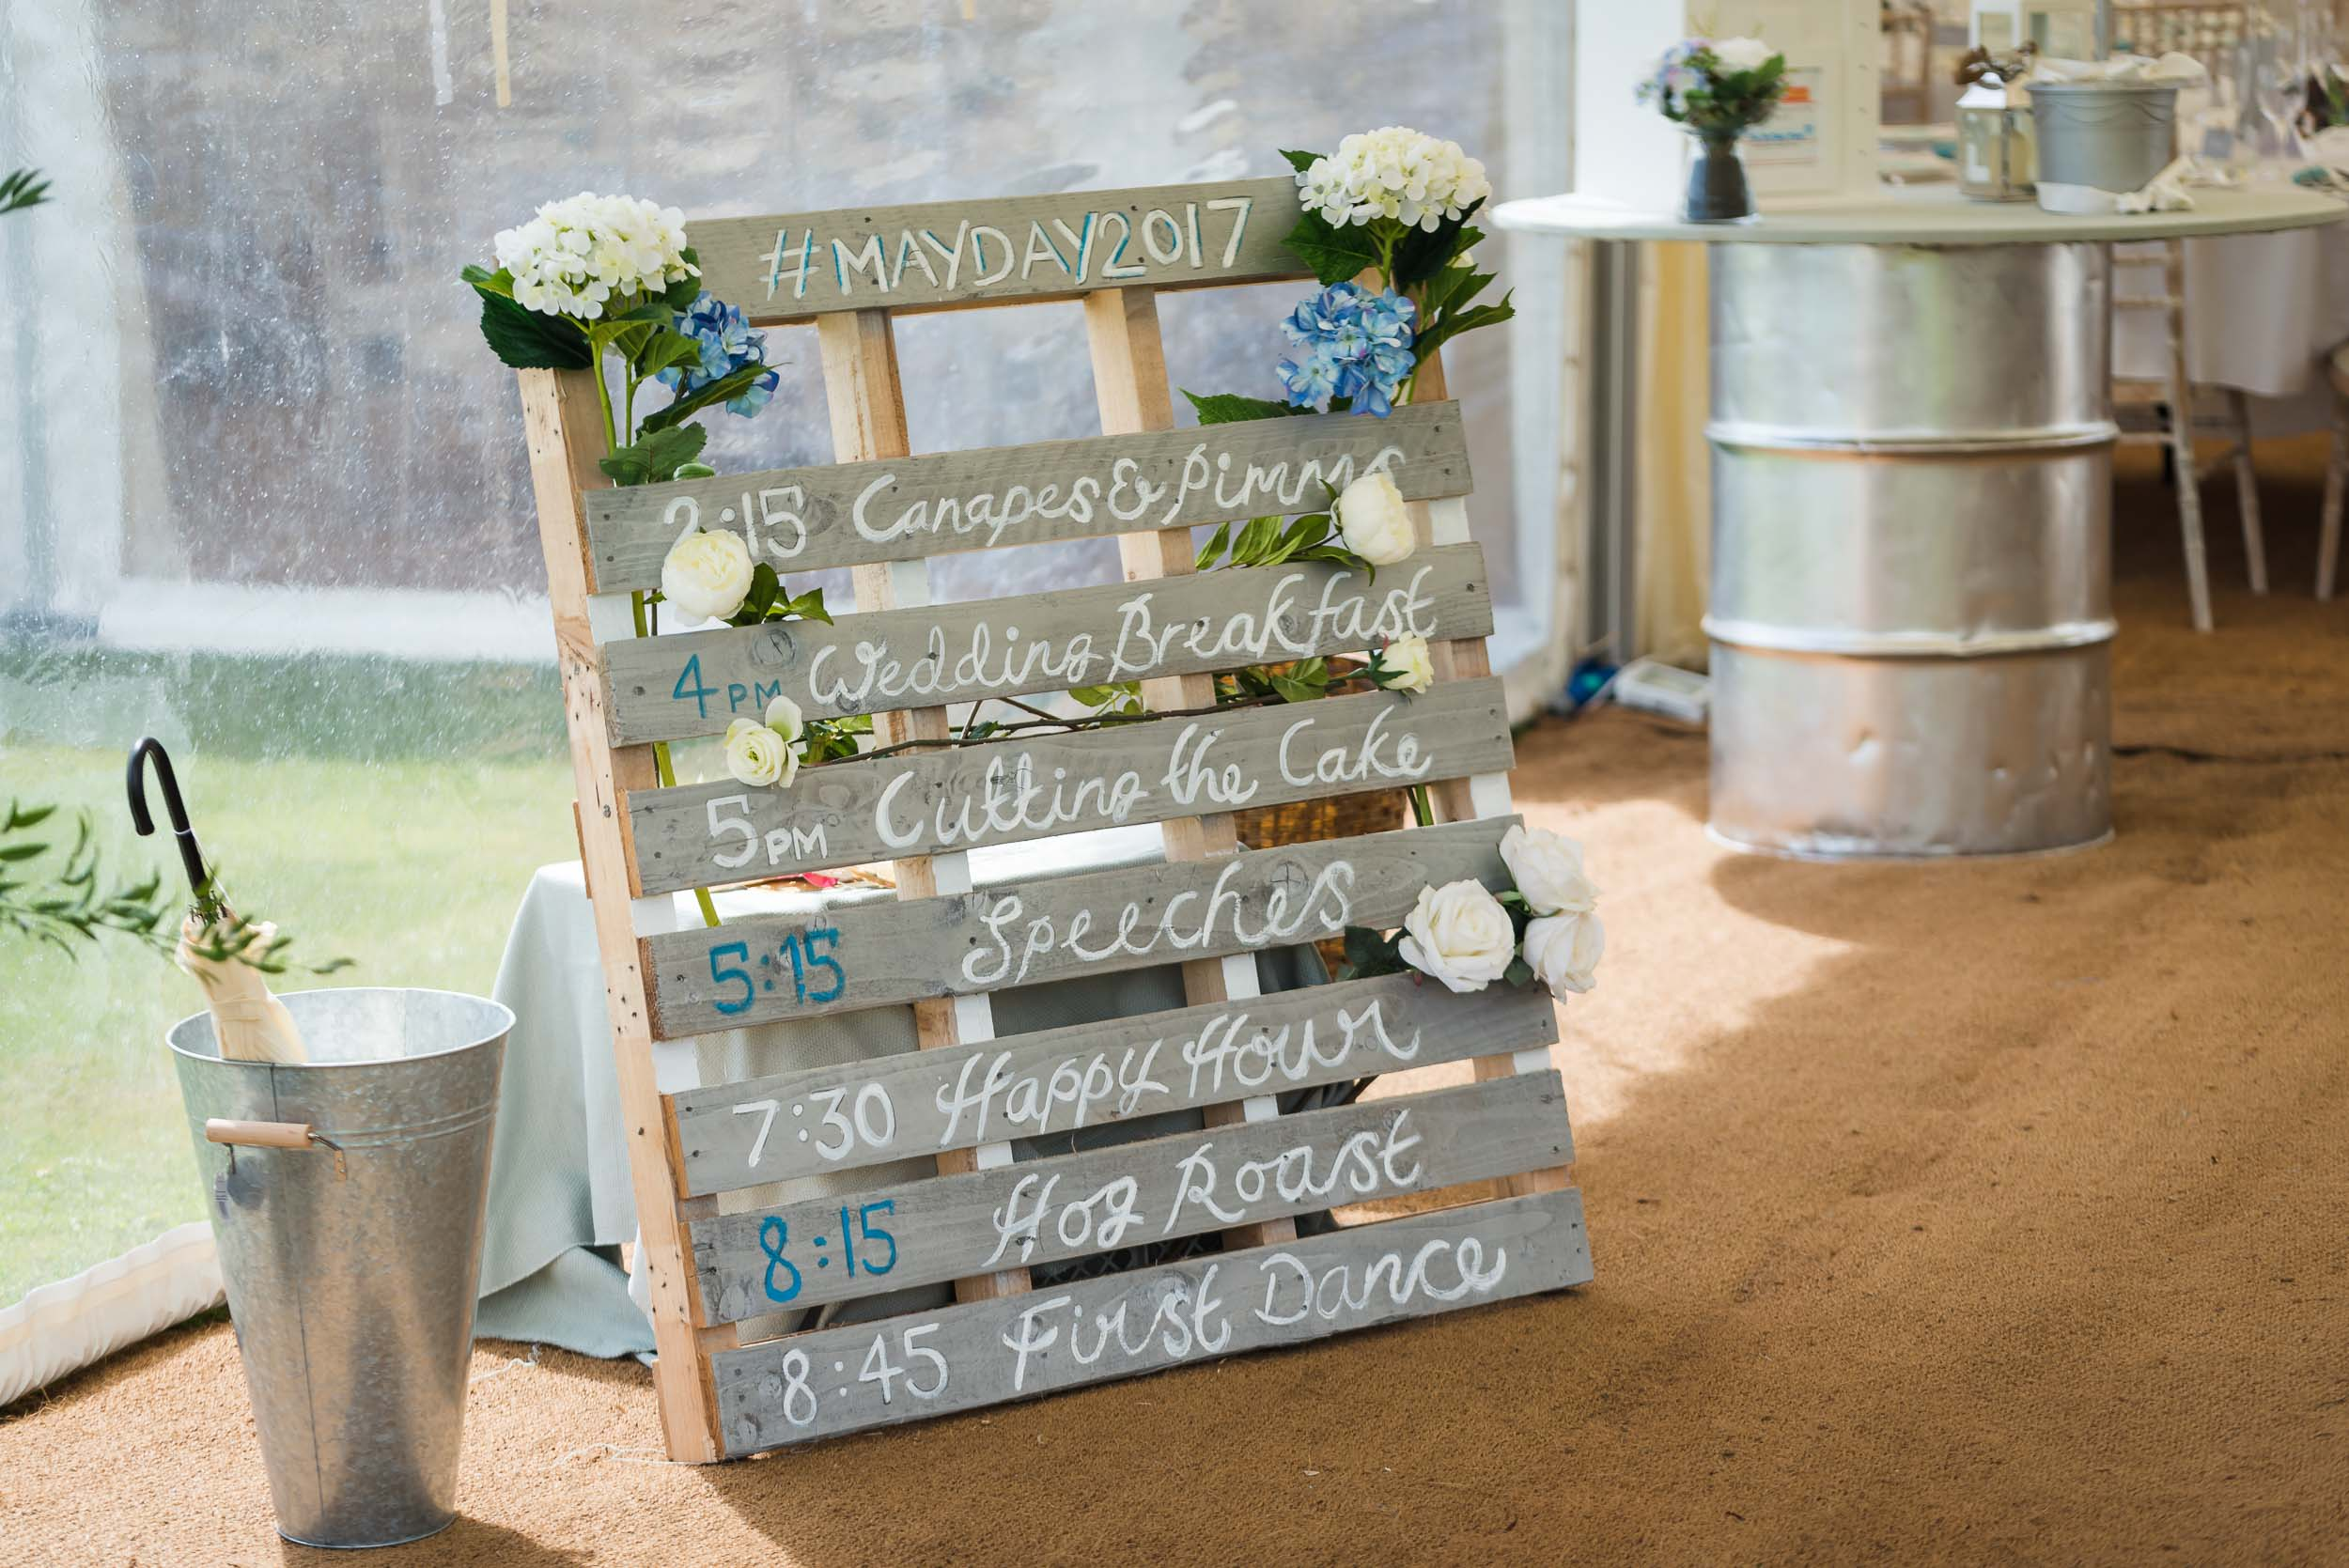 NC-20170722-sophie-and-jonny-wedding-1248.jpg